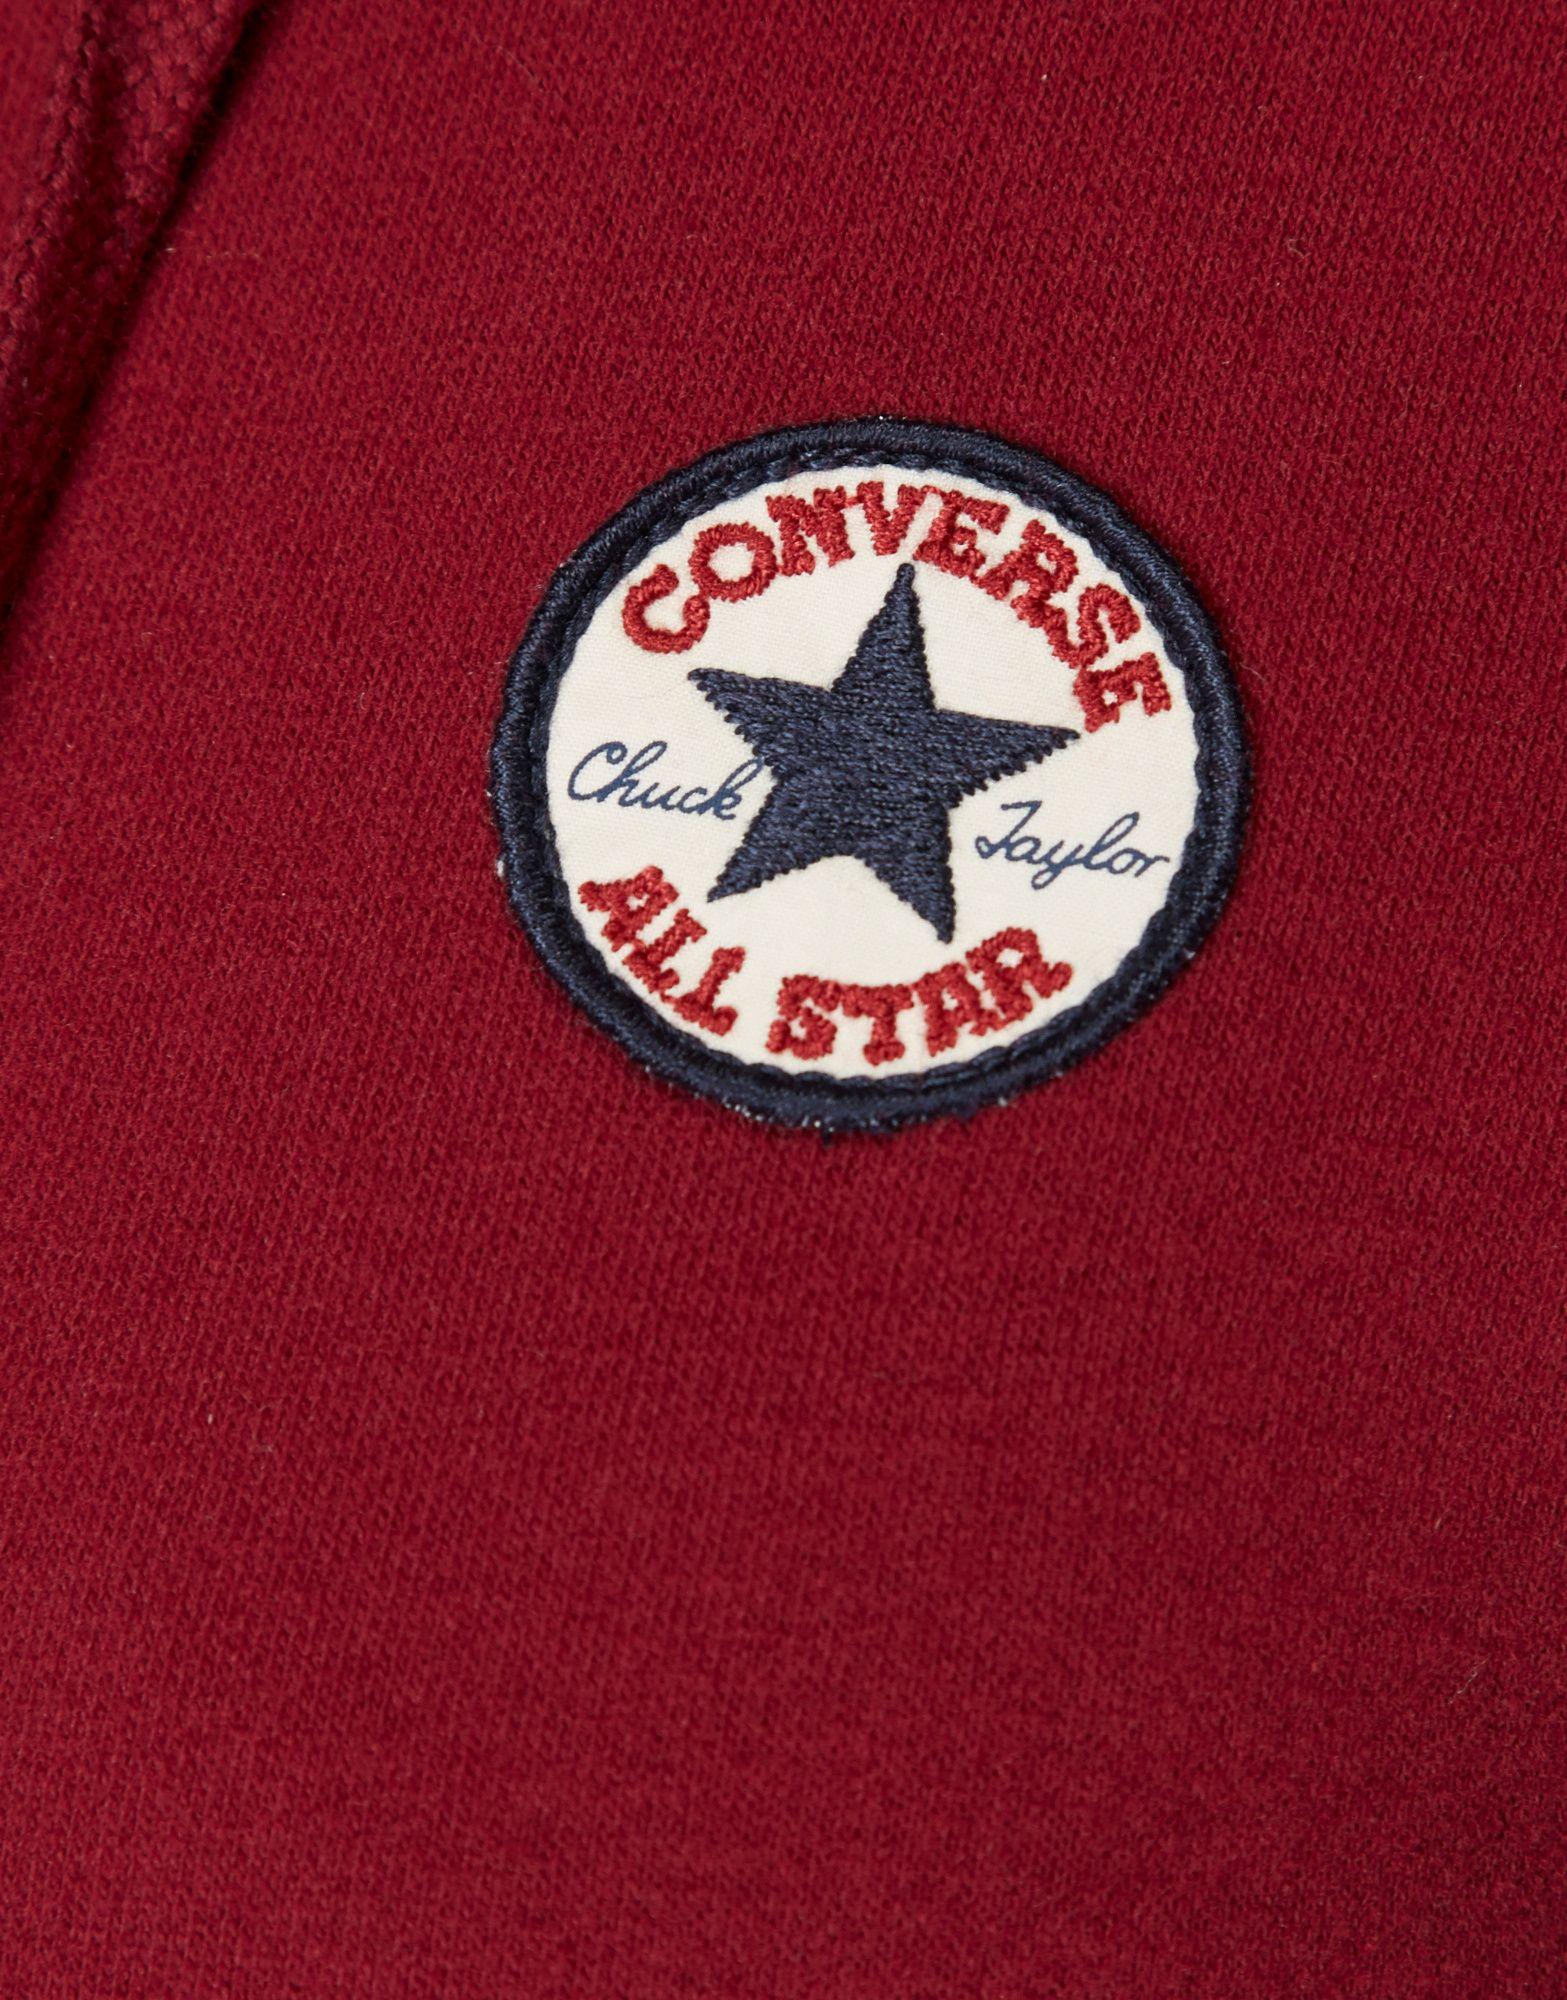 Converse Chuck Patch Hoody